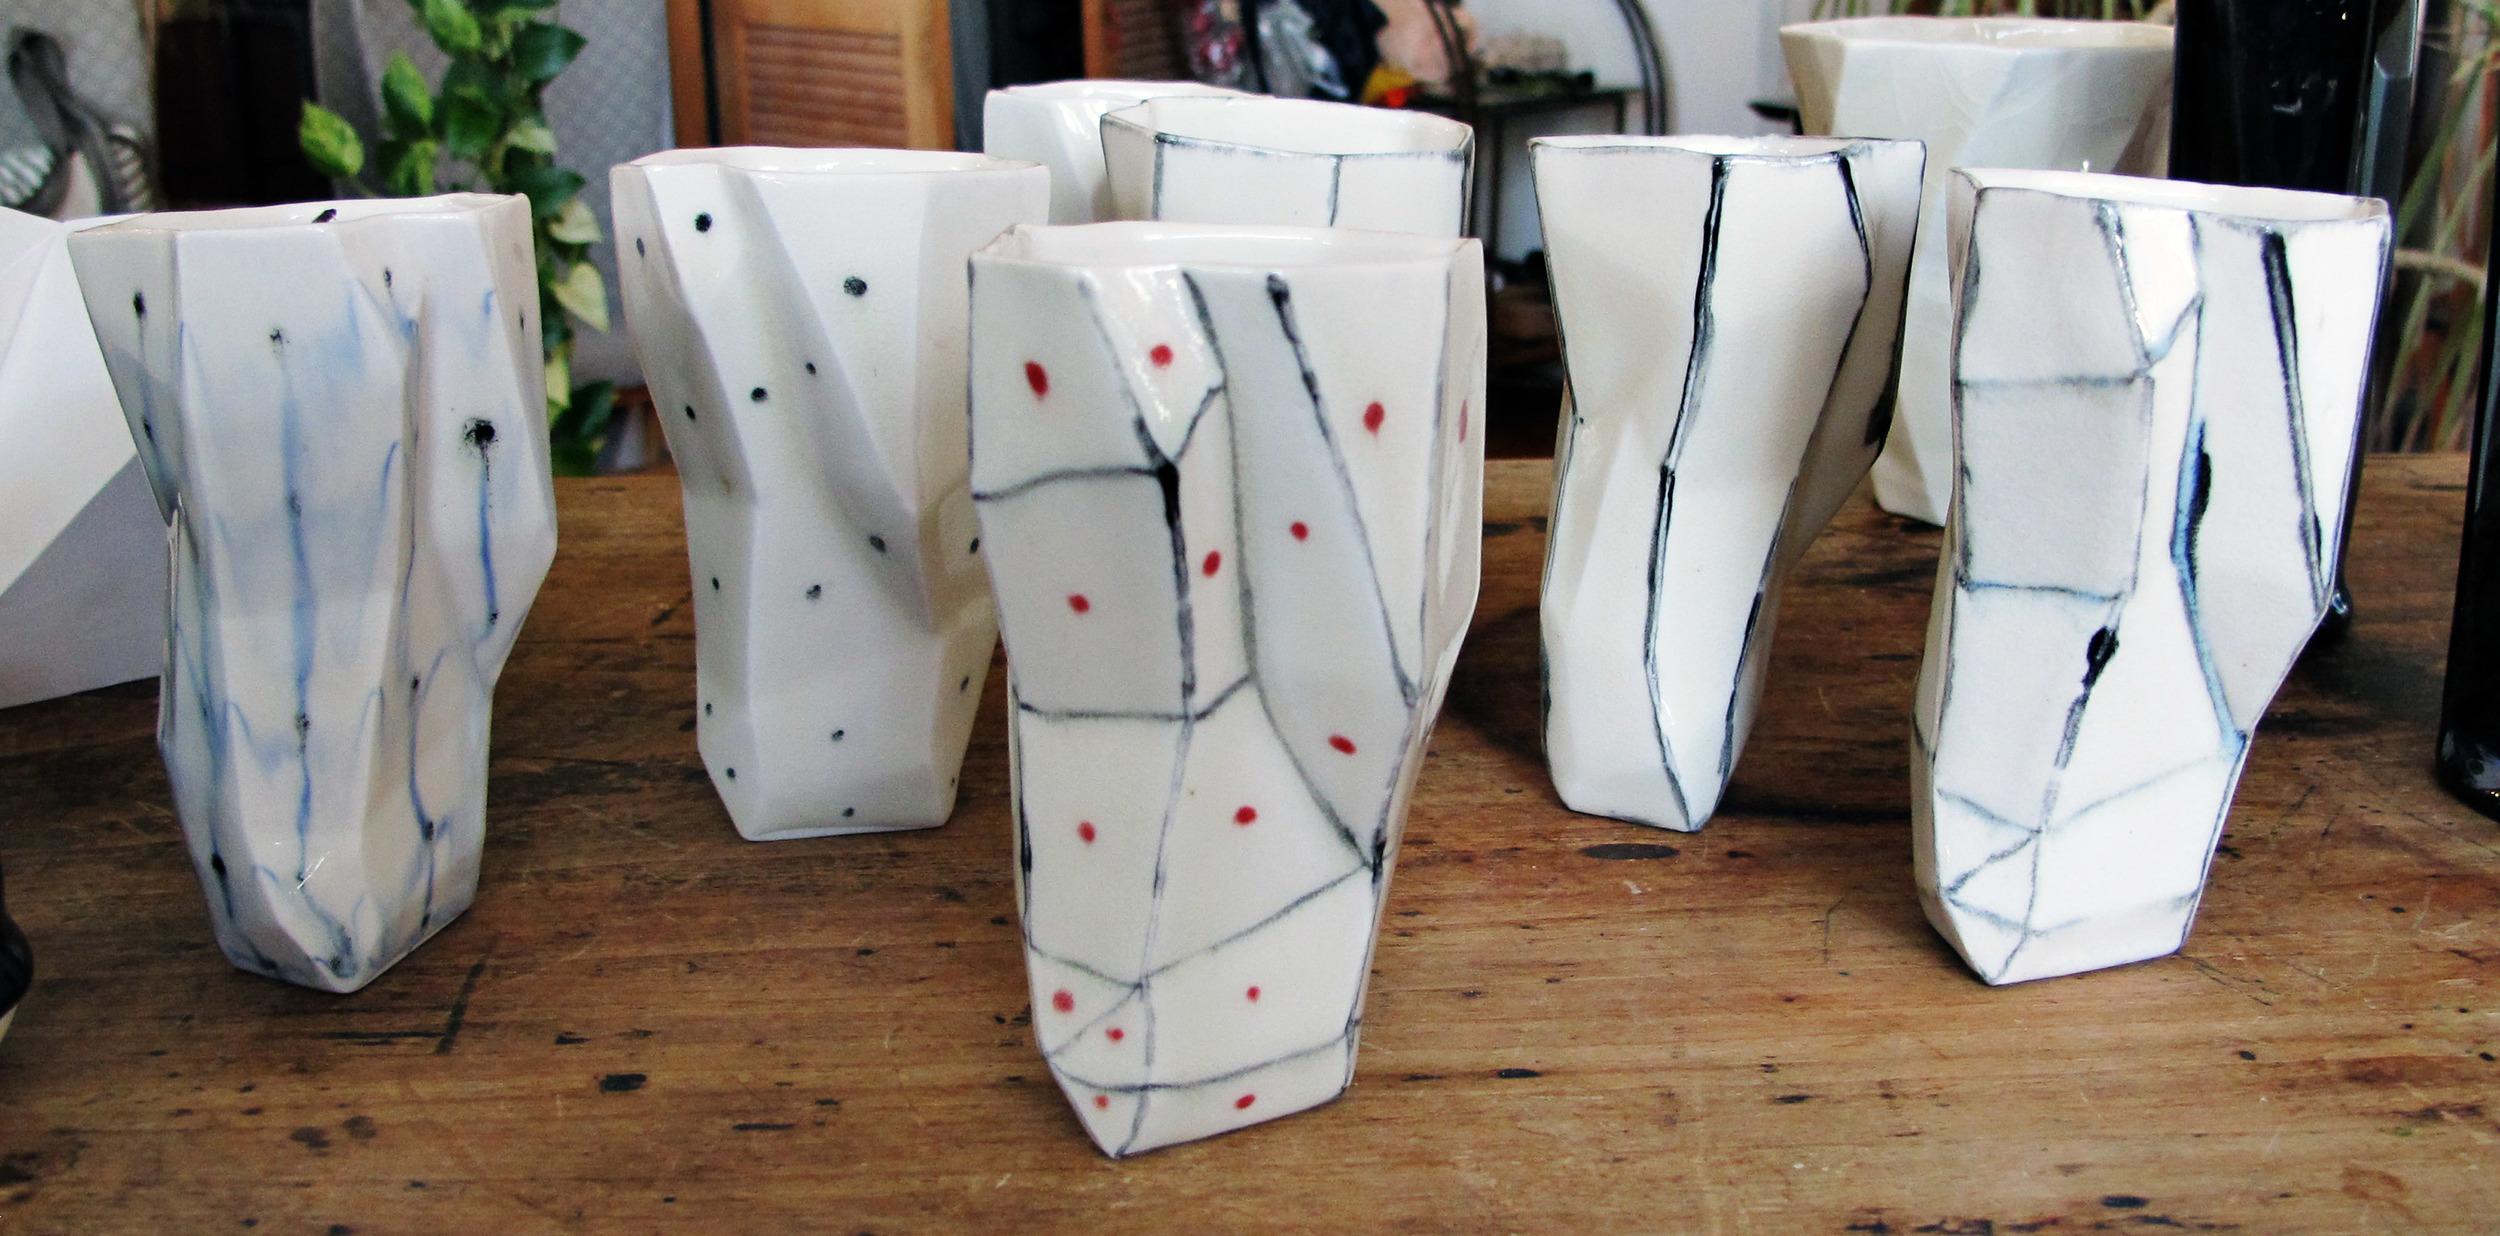 rh facet cups grouping.jpg